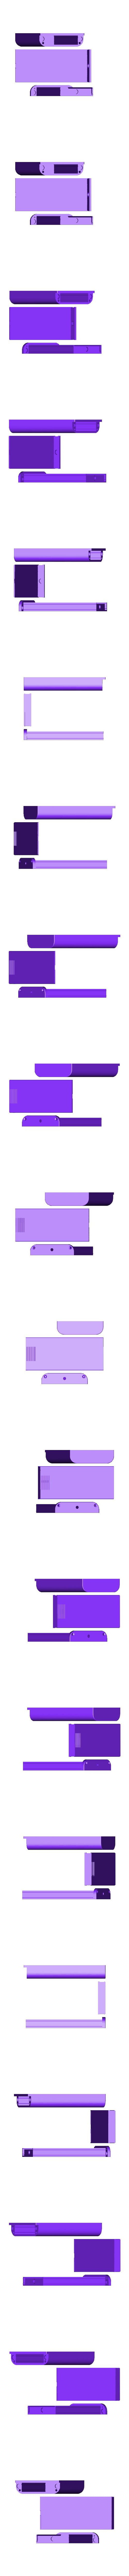 fullSet_lidDrawer_antenna.stl Download free STL file Magnetic WiFi Repeater Stash Box for Cash & Valuables • 3D printing model, sneaks